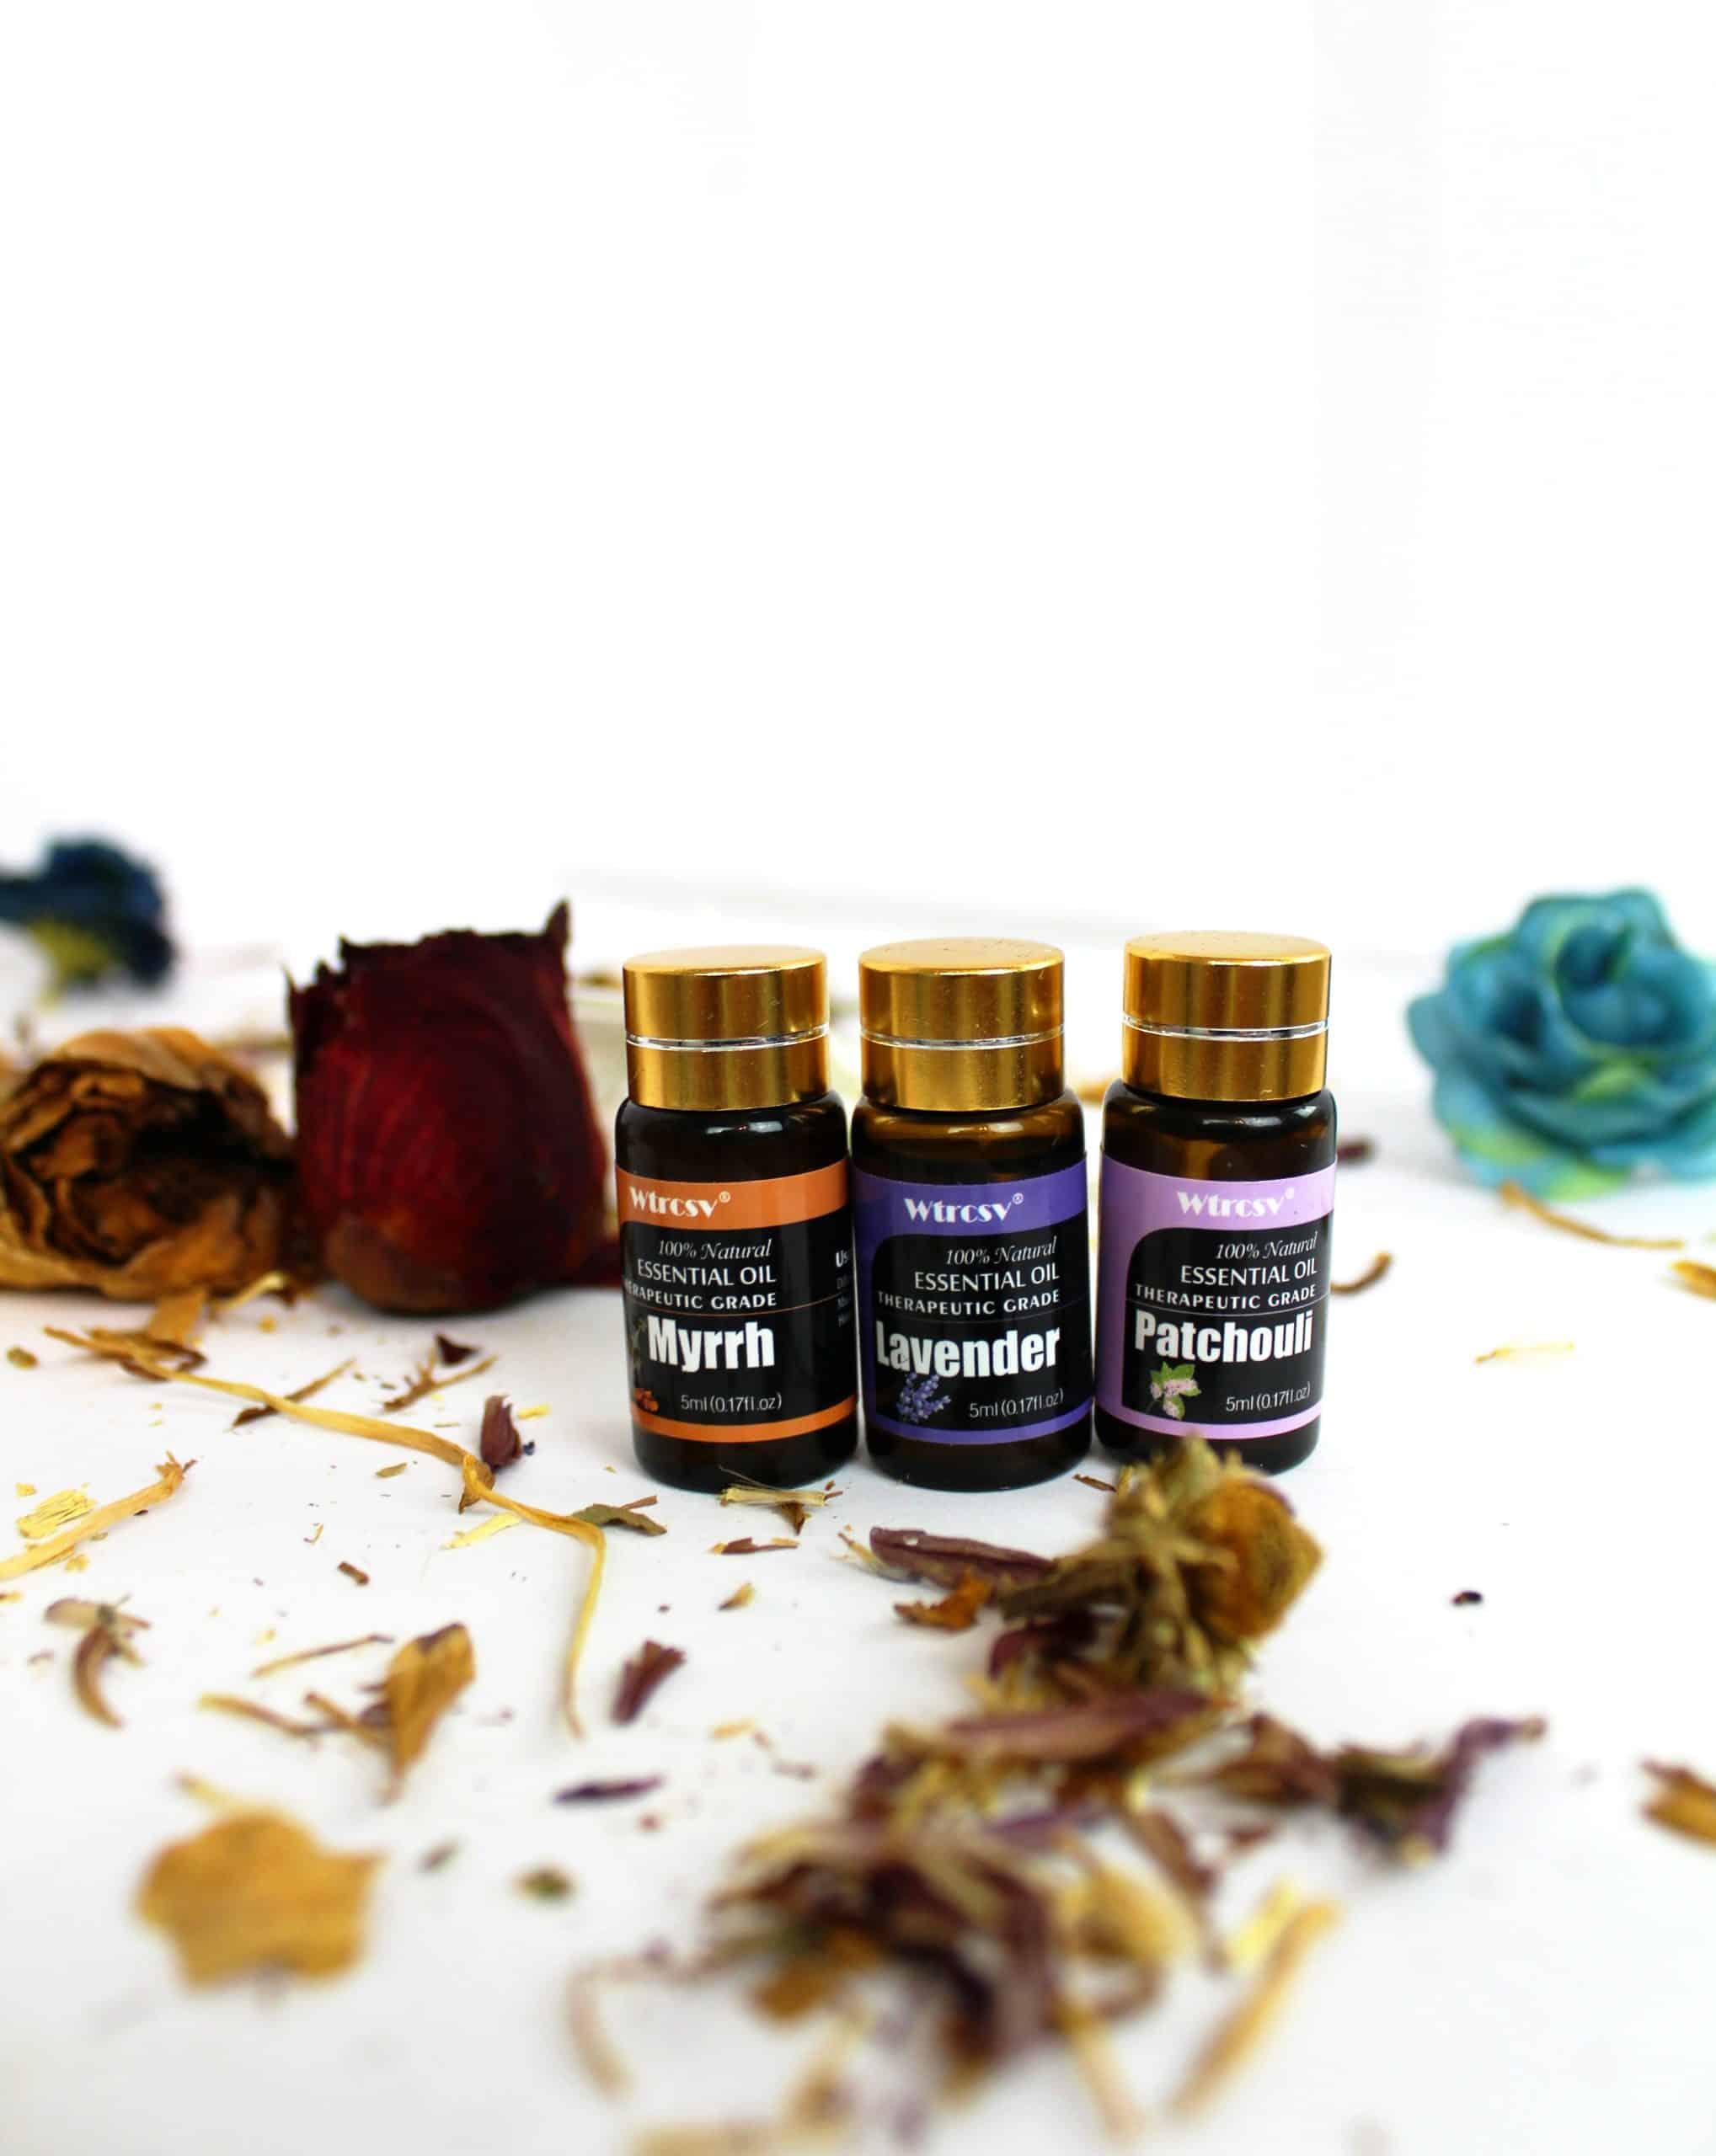 Myrrh Lavender Patchouli scaled